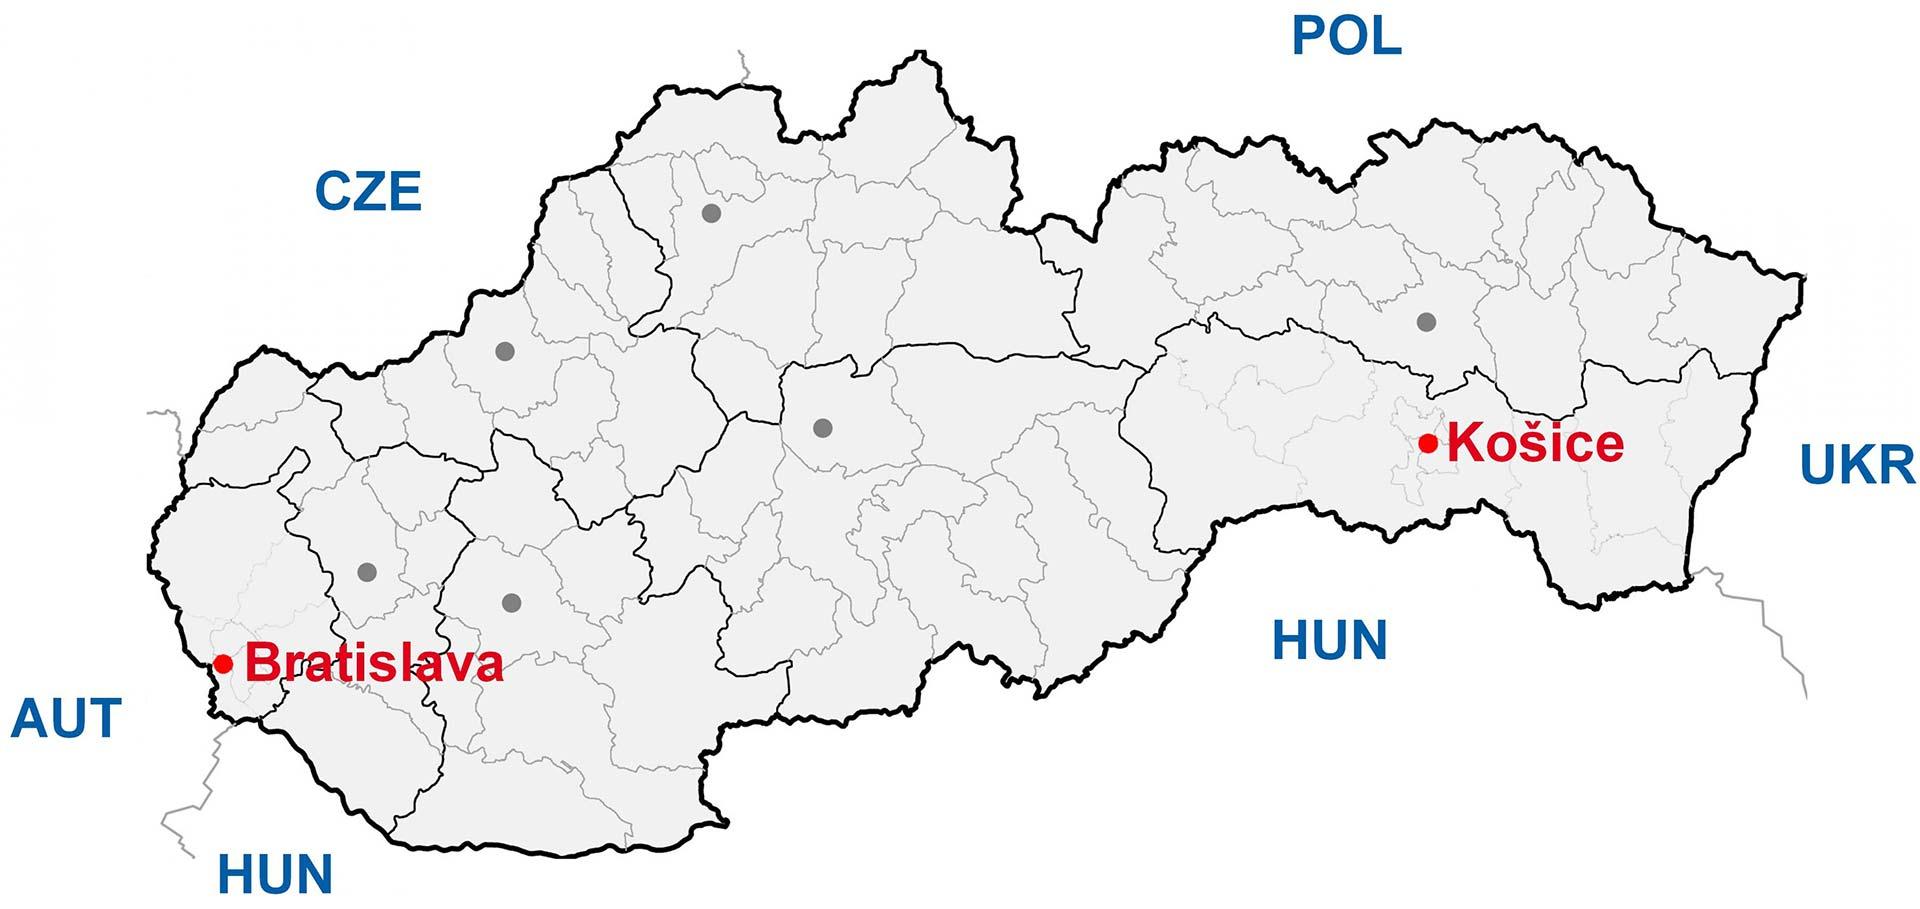 kosice slovacchia mappa 1920x1080 small